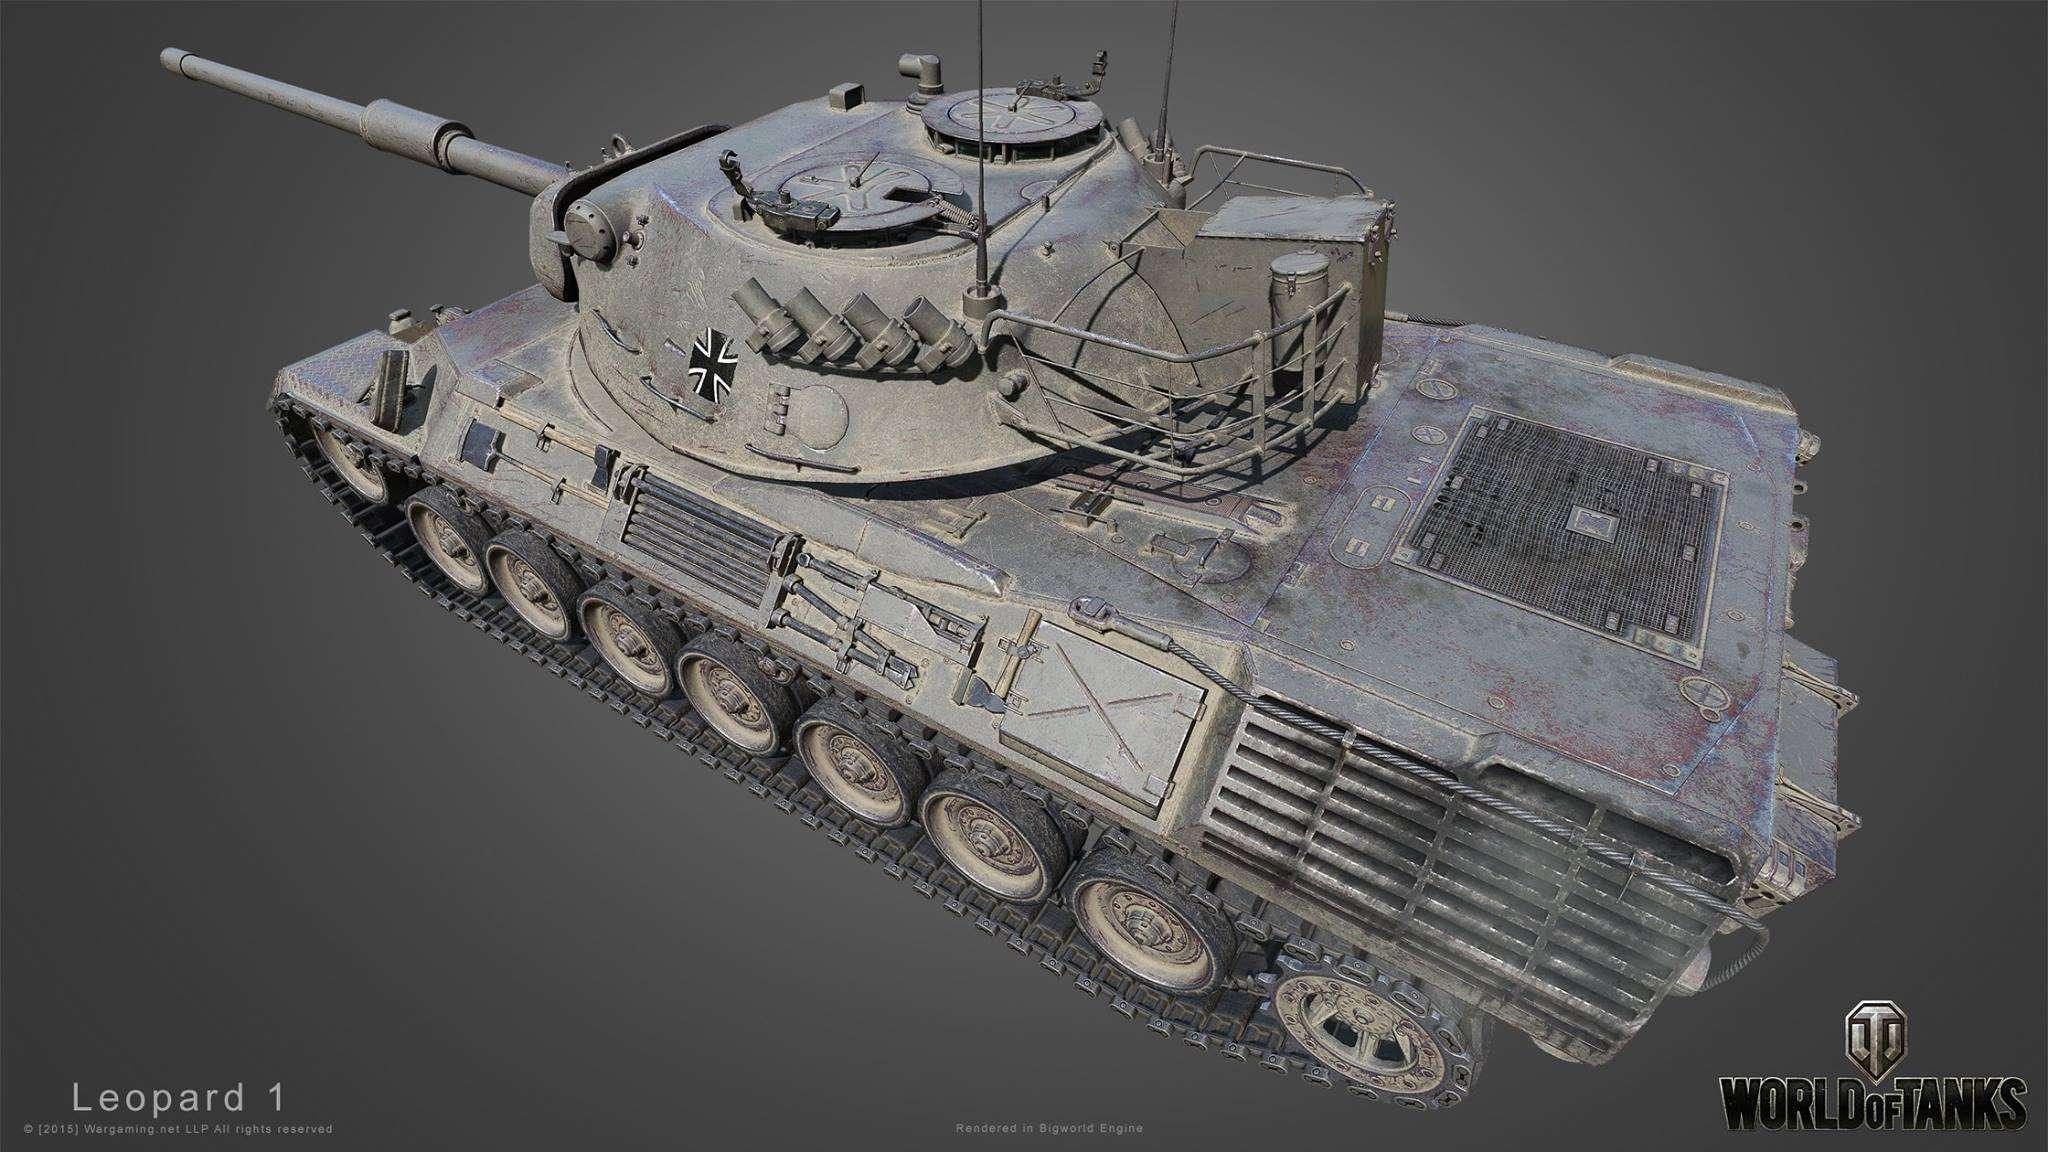 Leopard 1 hd gosu world of tanks